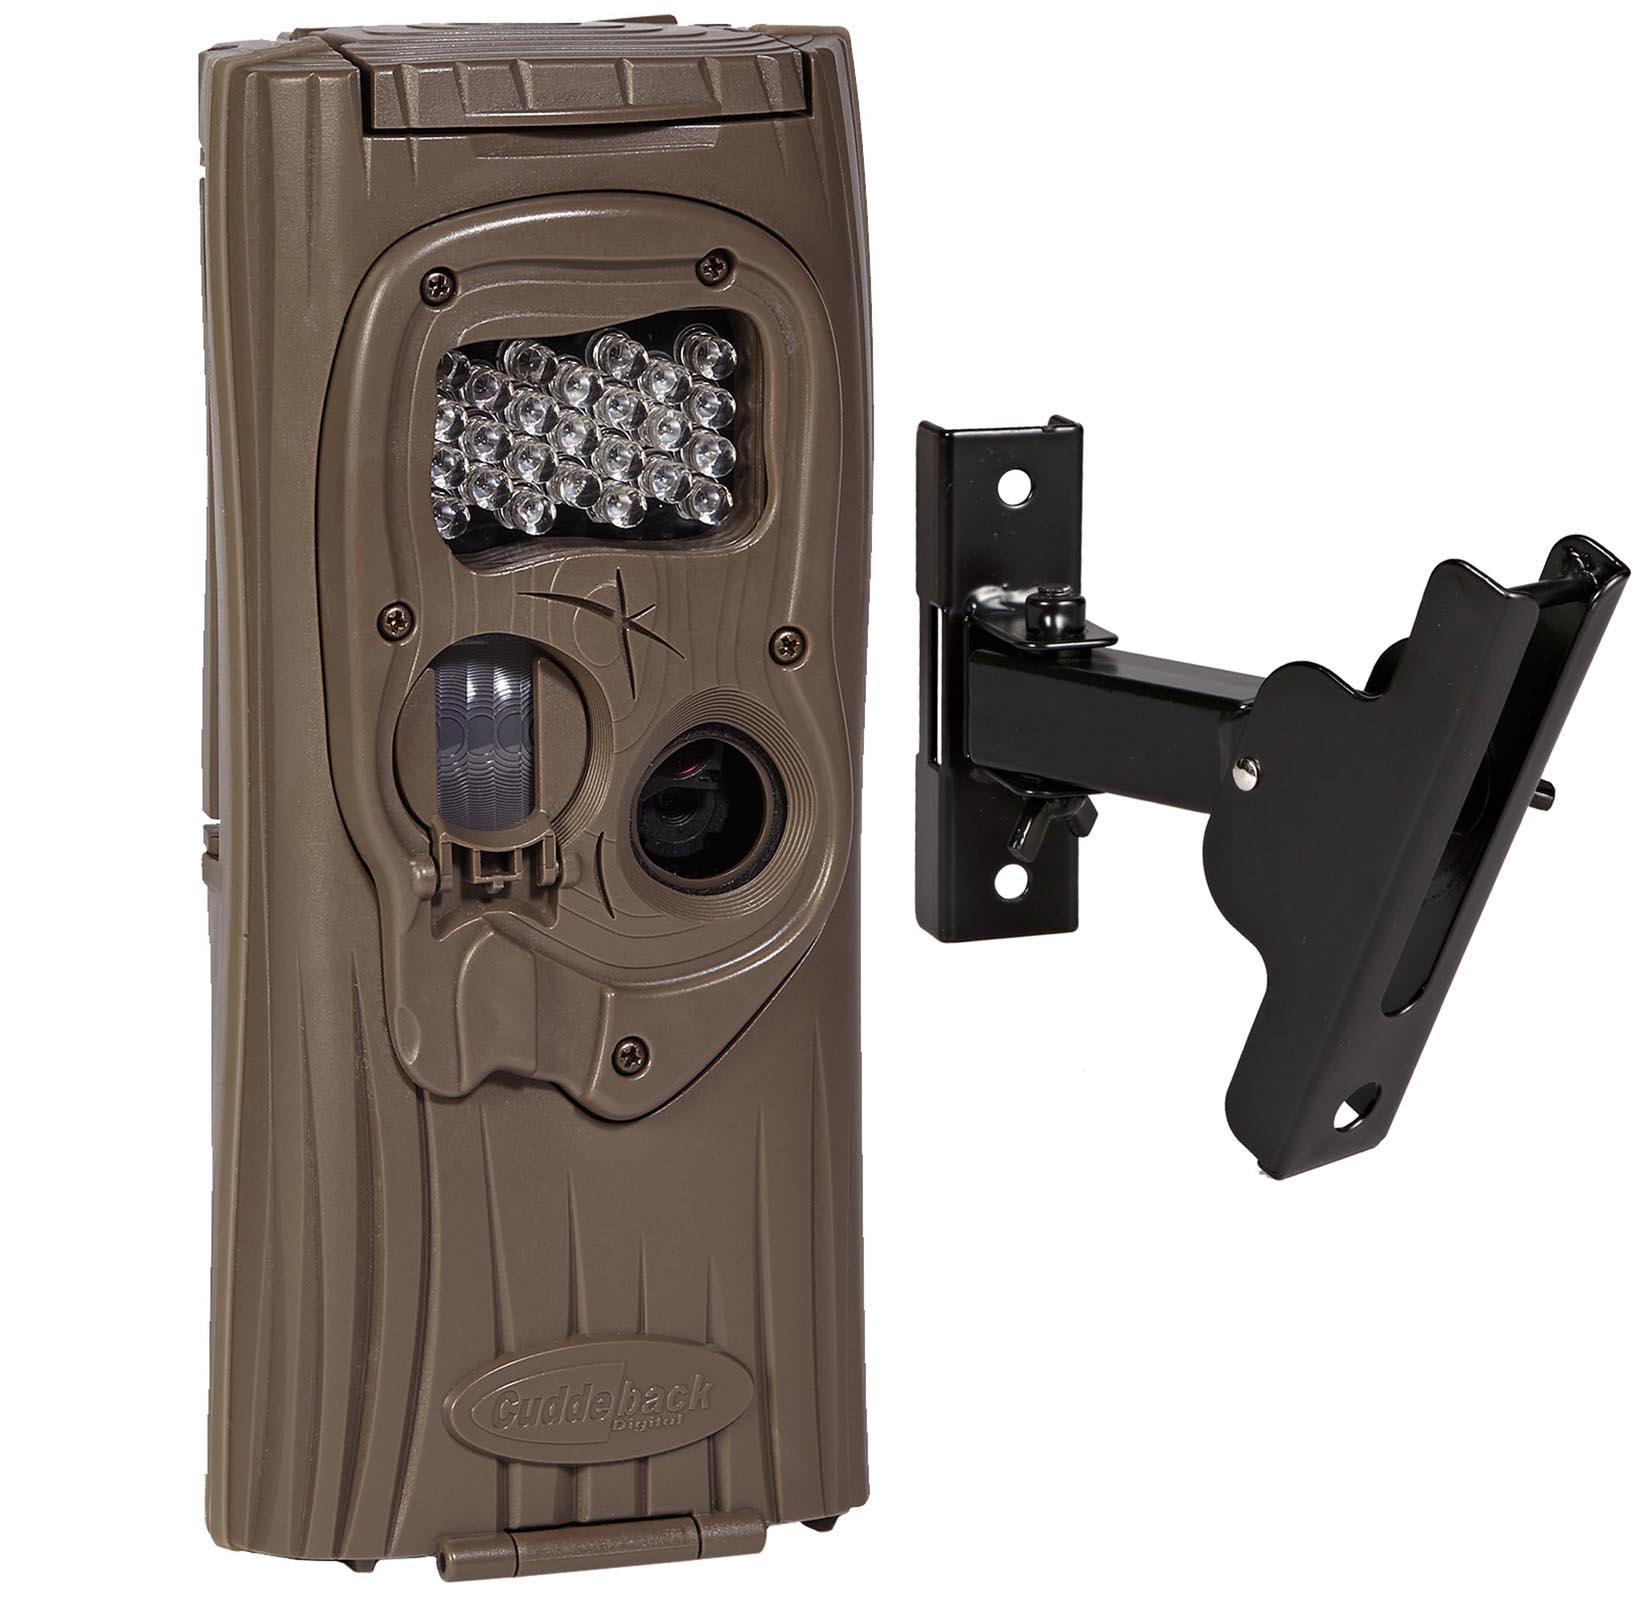 Cuddeback 8MP F2 IR Plus Infrared Trail Game Hunting Came...